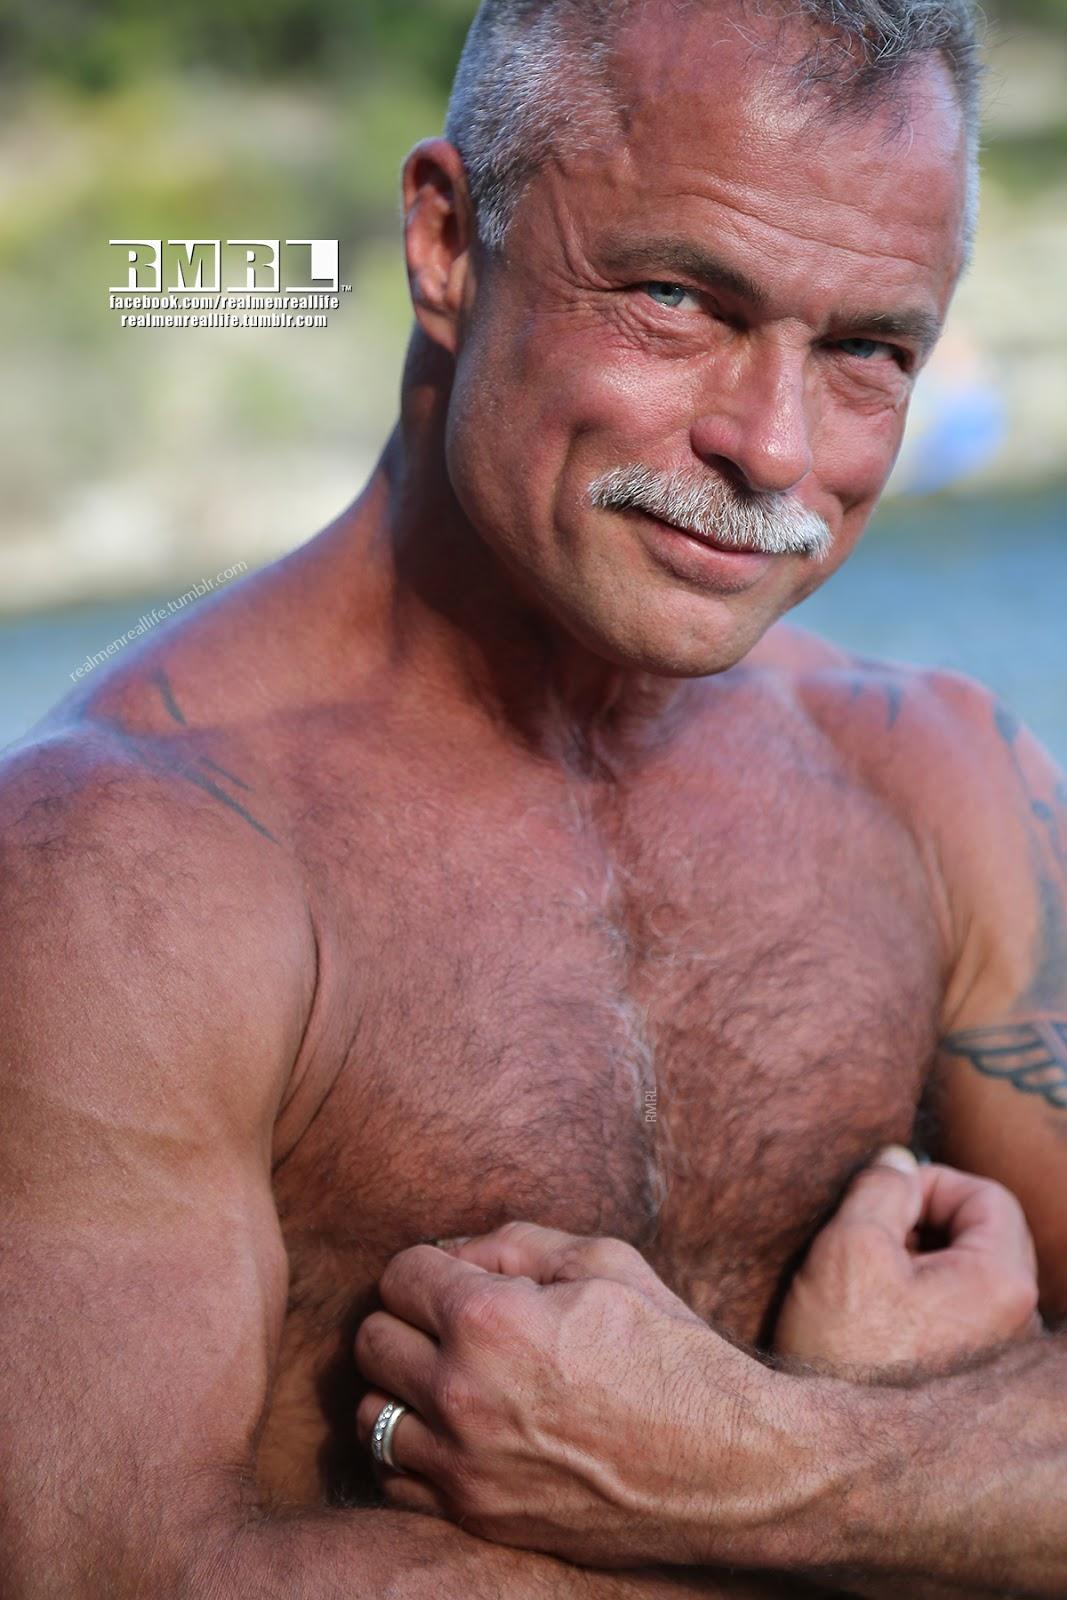 Brutos-Eros David Realmenreallife-9239